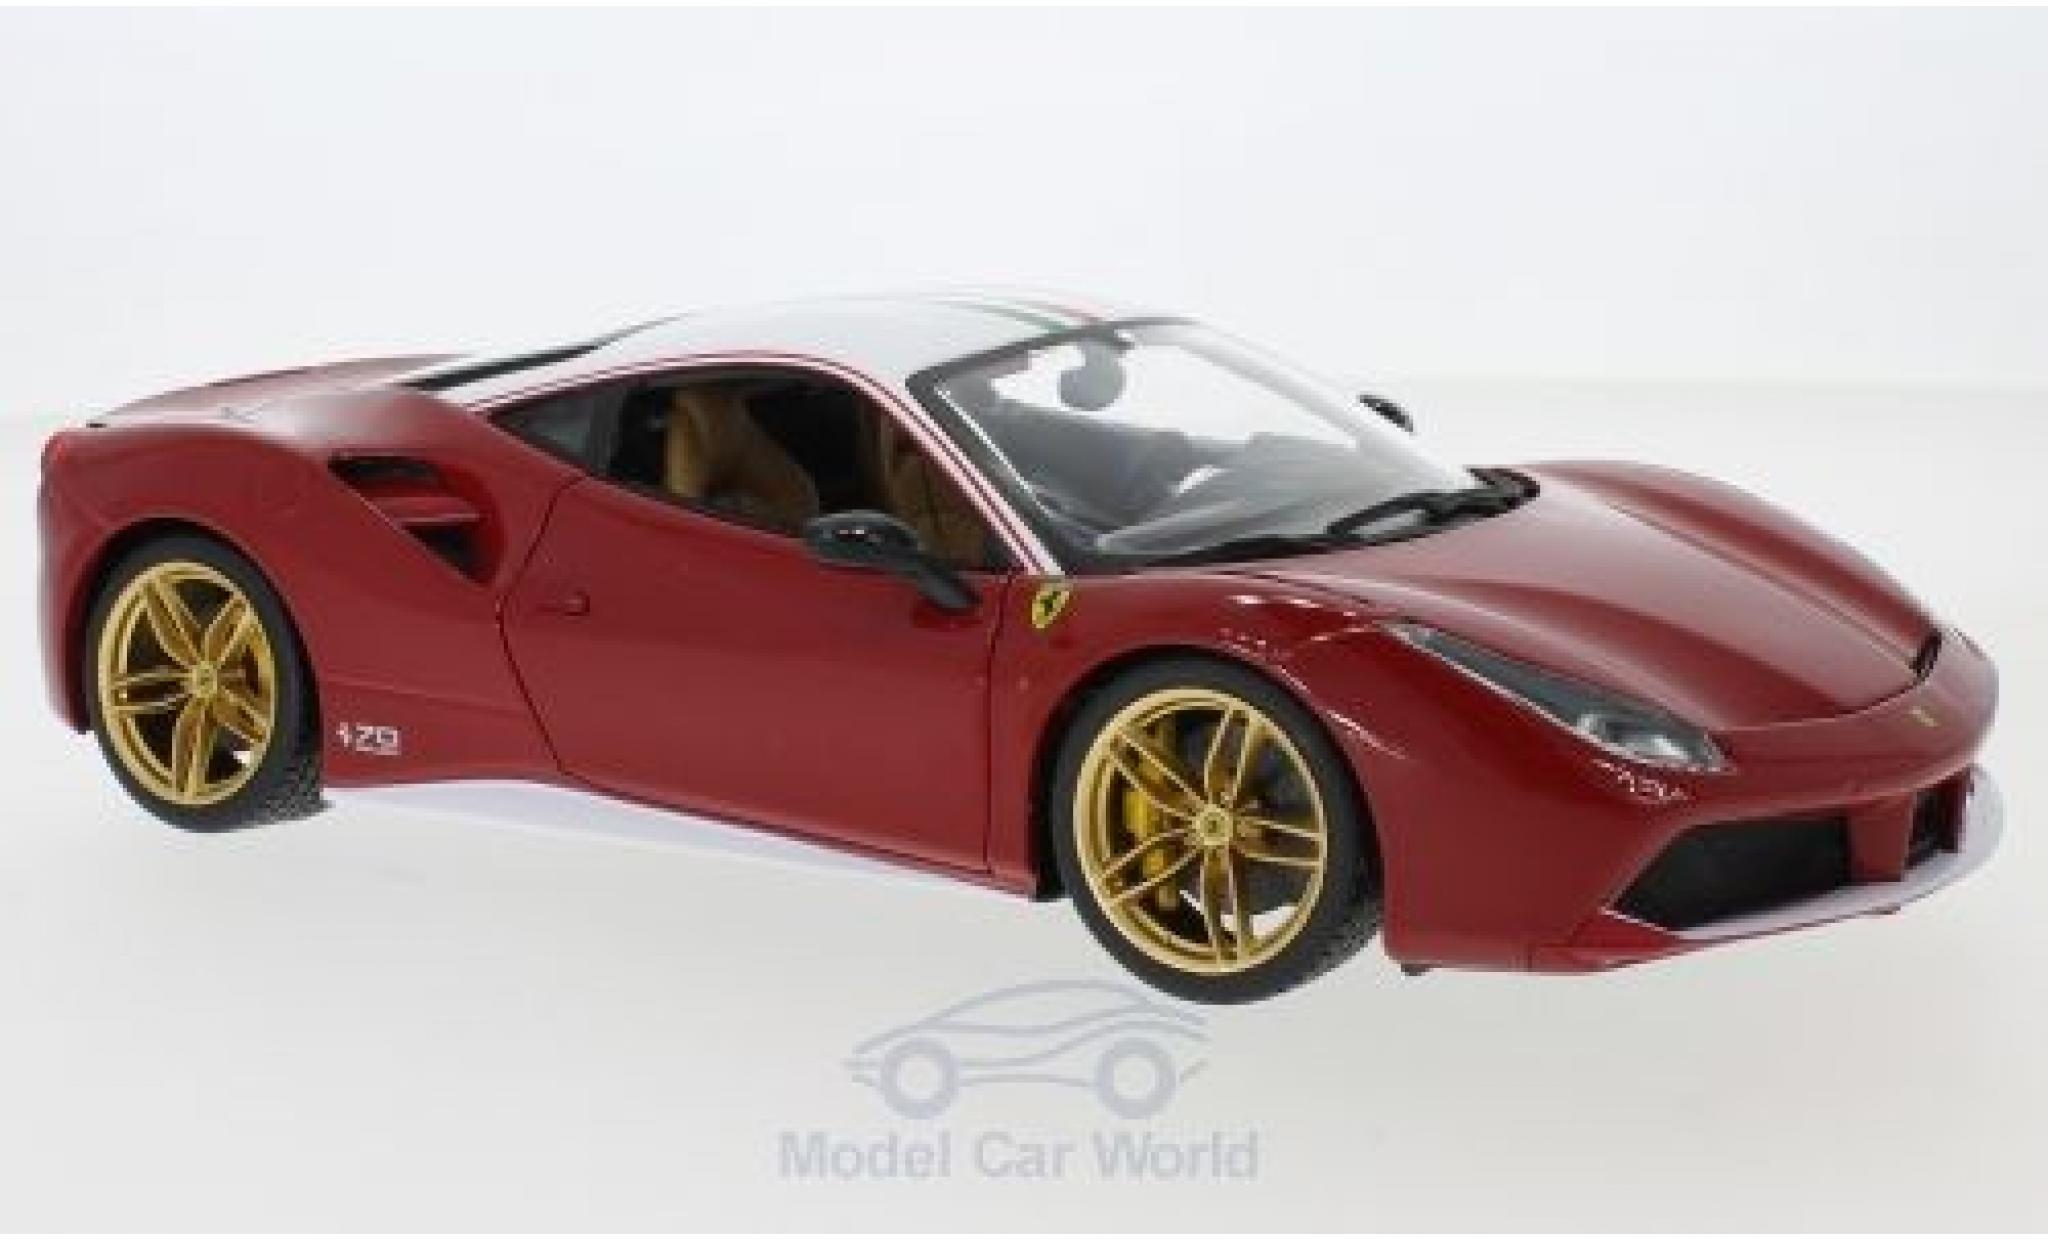 Ferrari 488 1/18 Bburago GTB rouge/blanche The Lauda 2017 70 Jahre